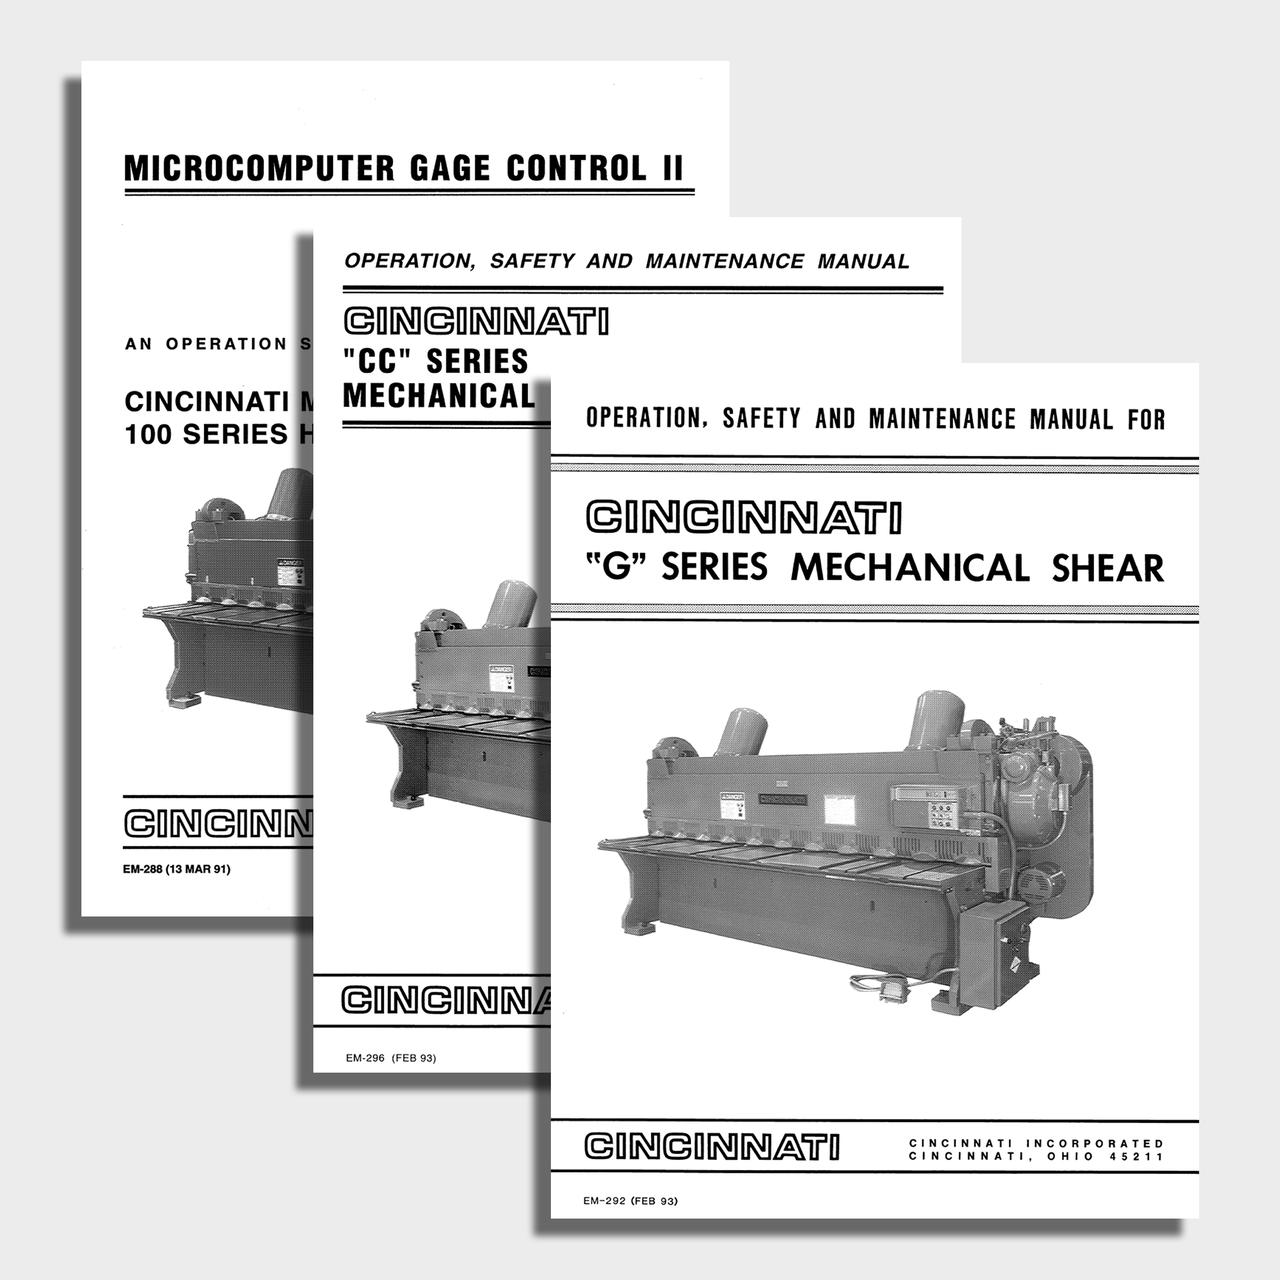 G Series Mechanical CNC Shear Manual Bundle